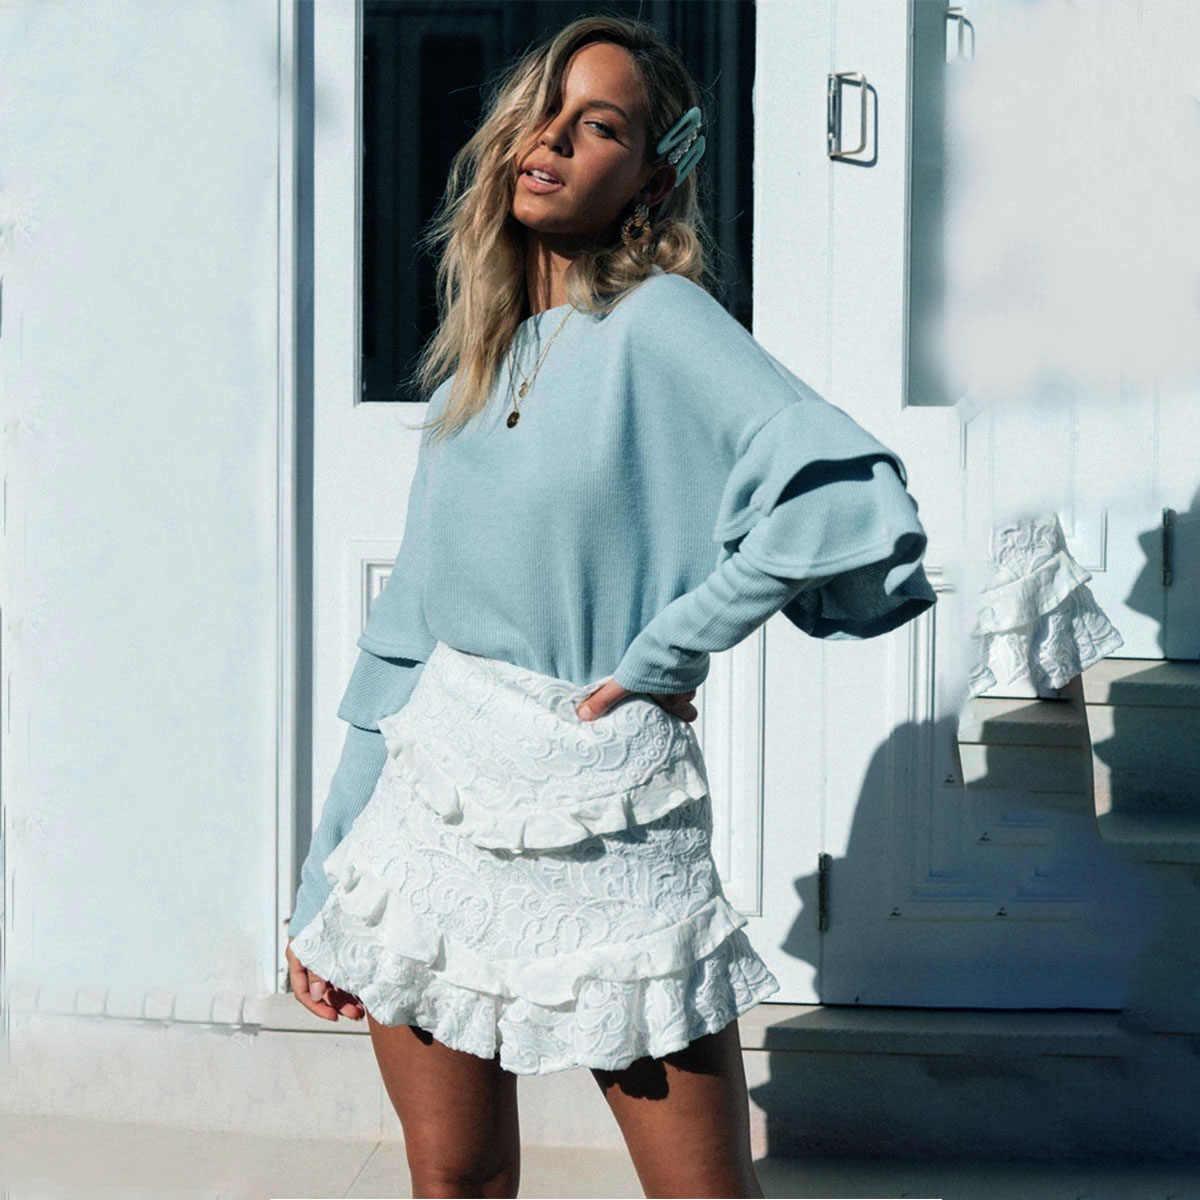 Moletom Feminino Direct Selling Sale Unicorn Panda 2019 Autumn And Winter Lotus Leaf Sleeve Pit Shirt Hoodies Women's Clothing